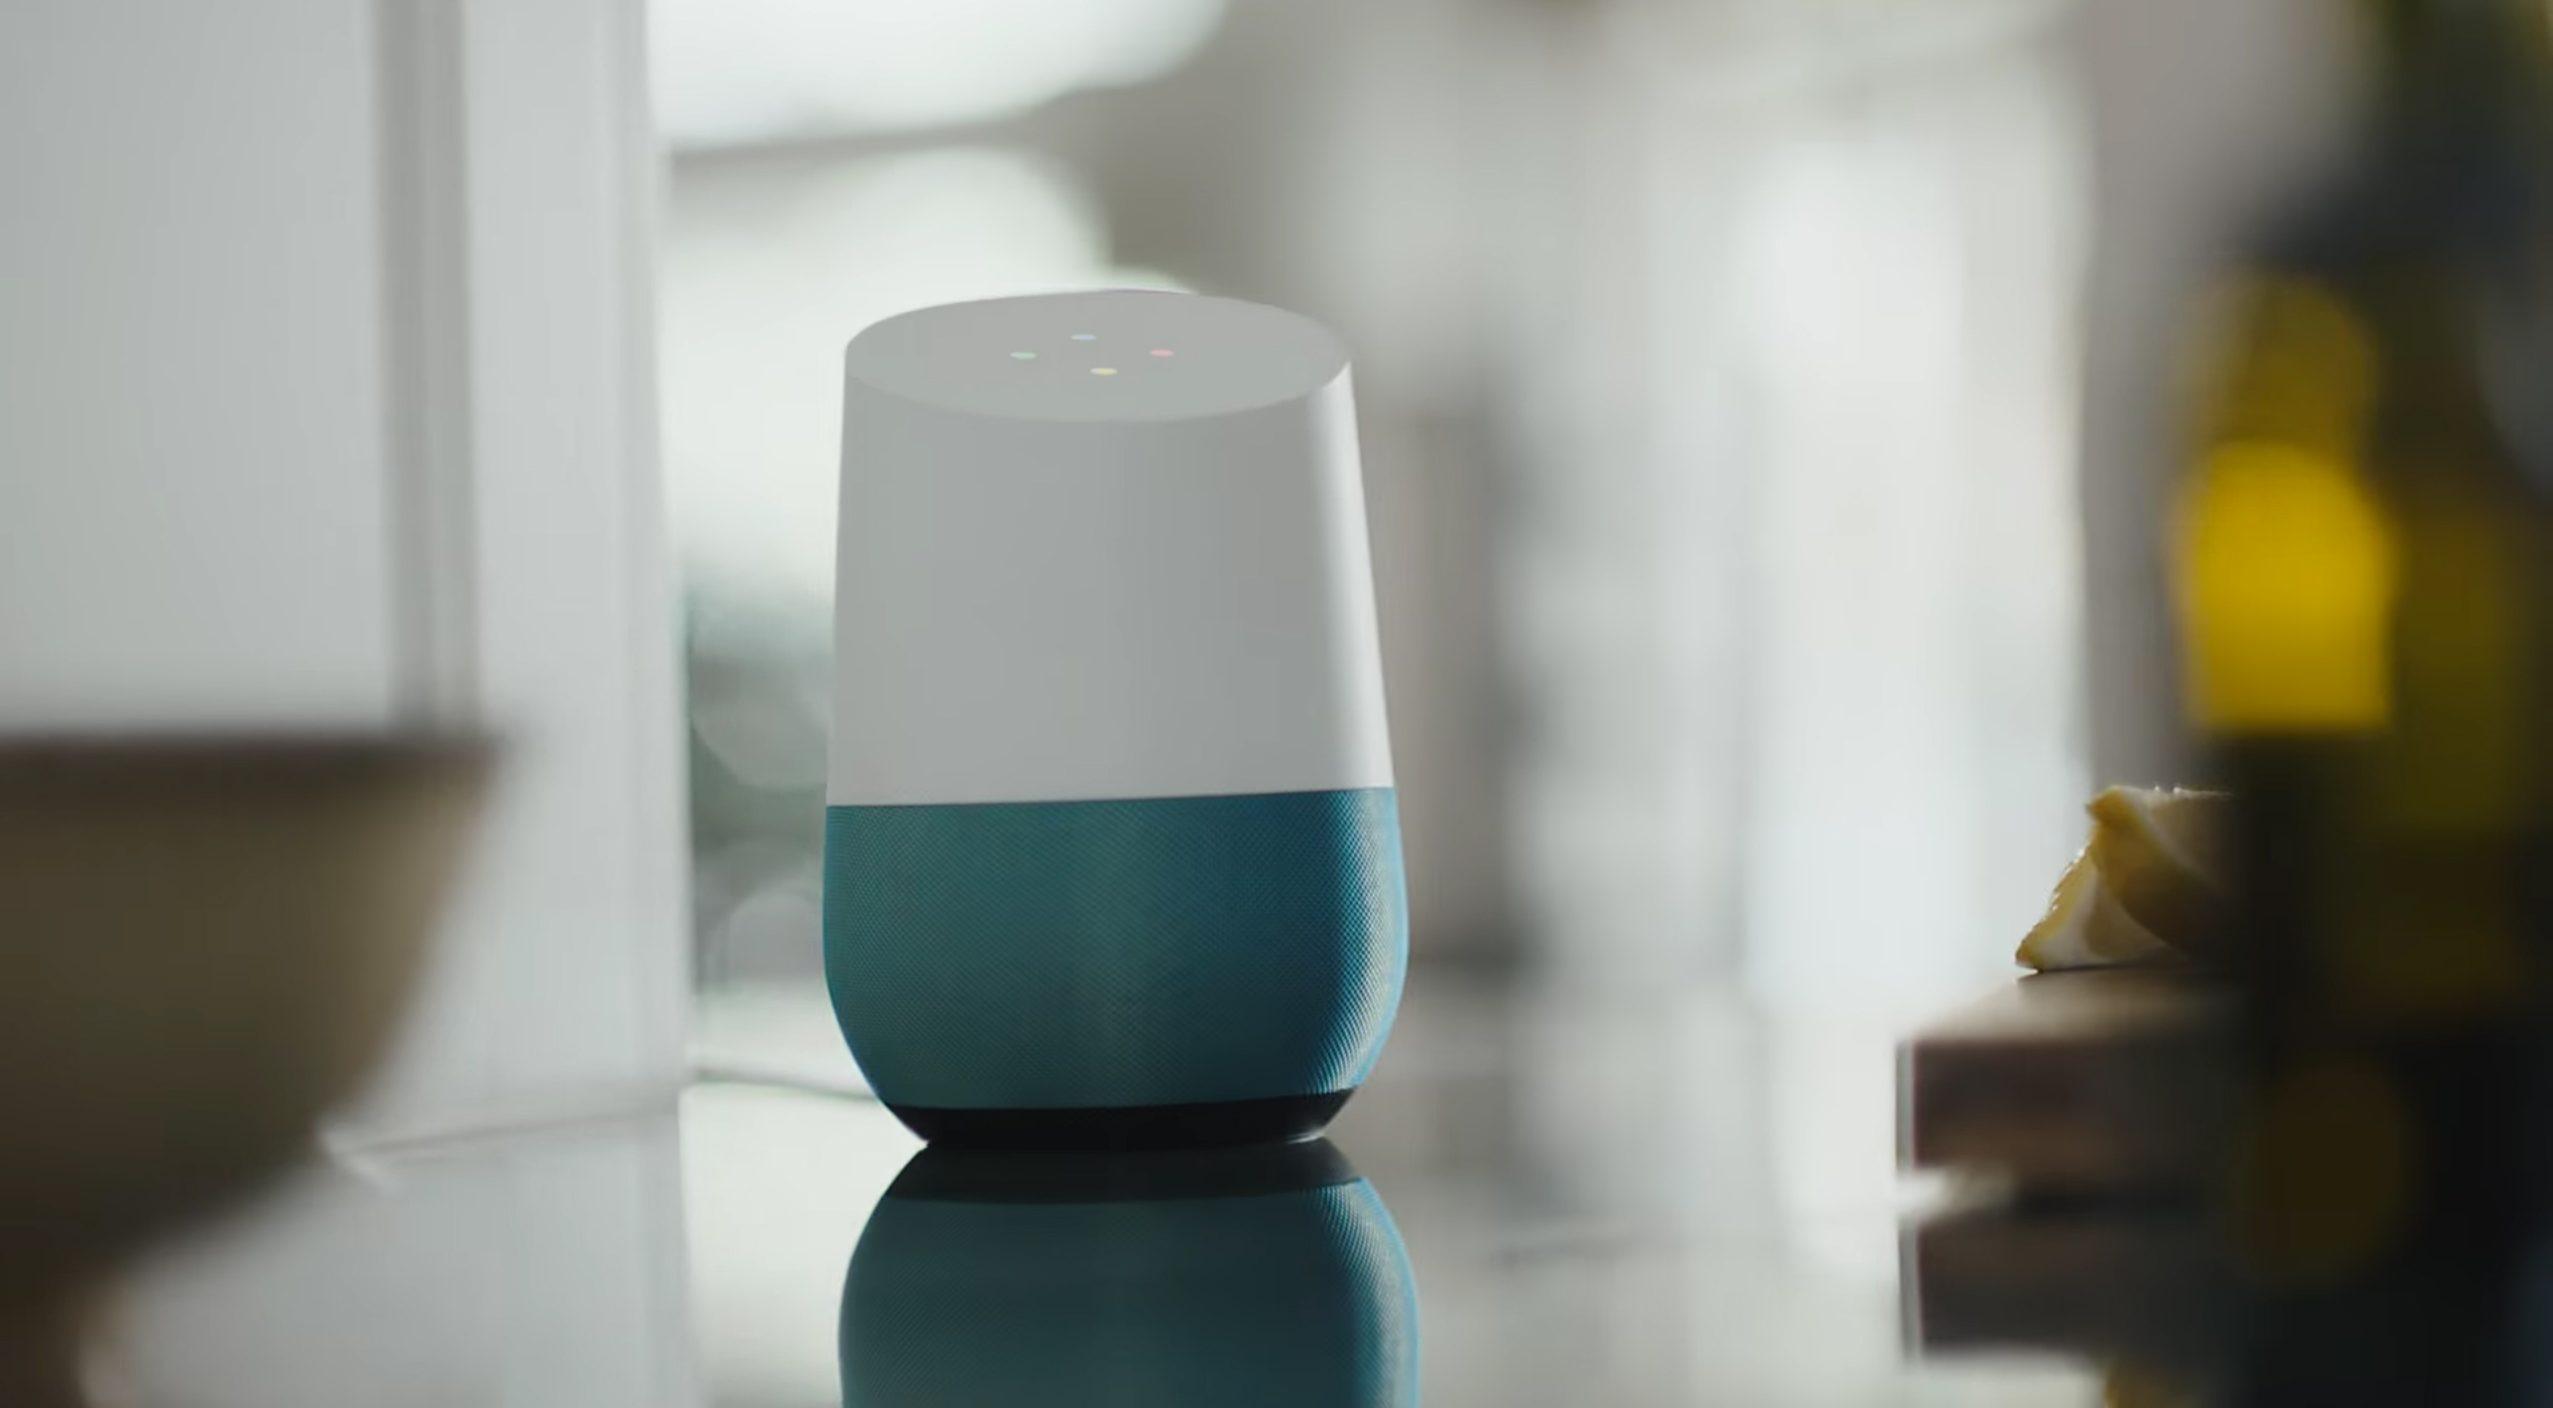 Google Home - voice command